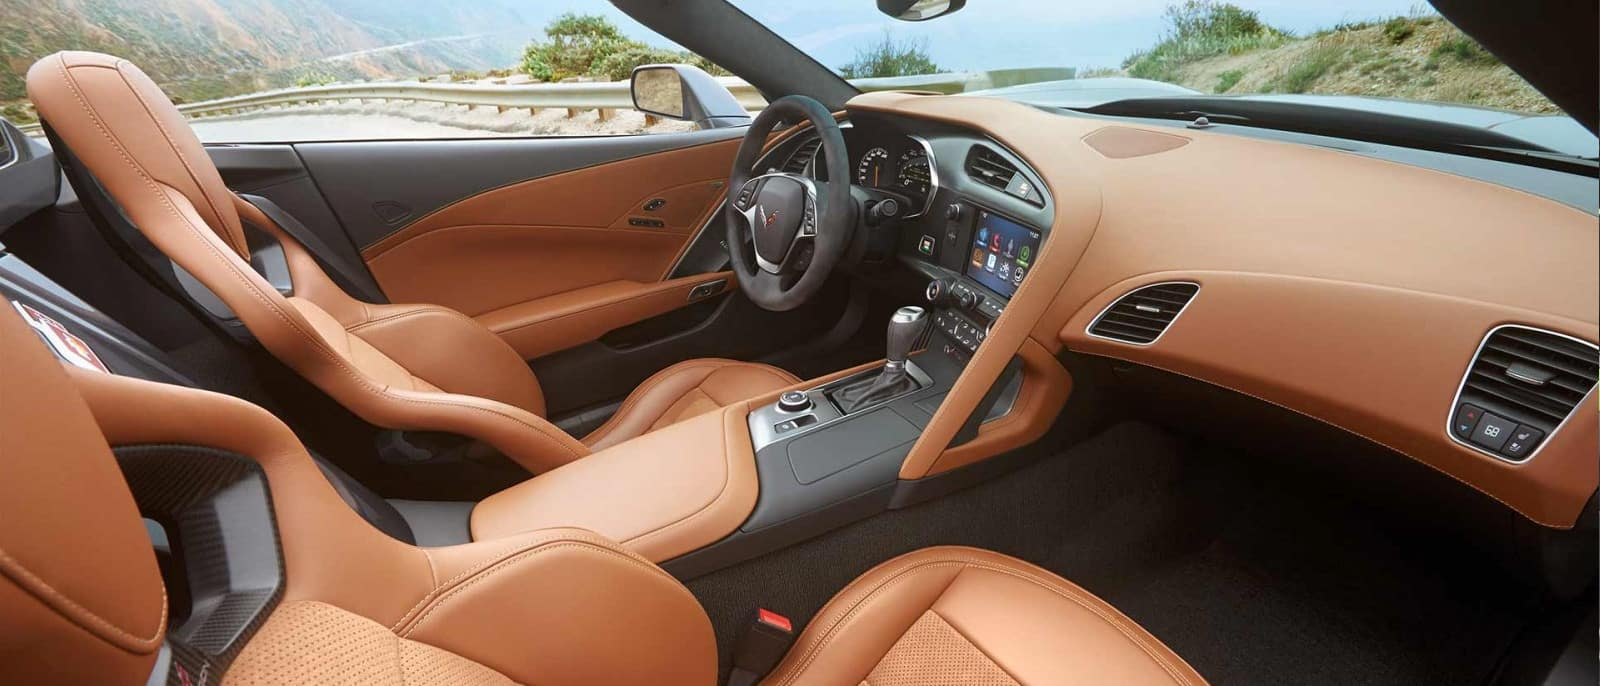 2014 Chevy Corvette interior